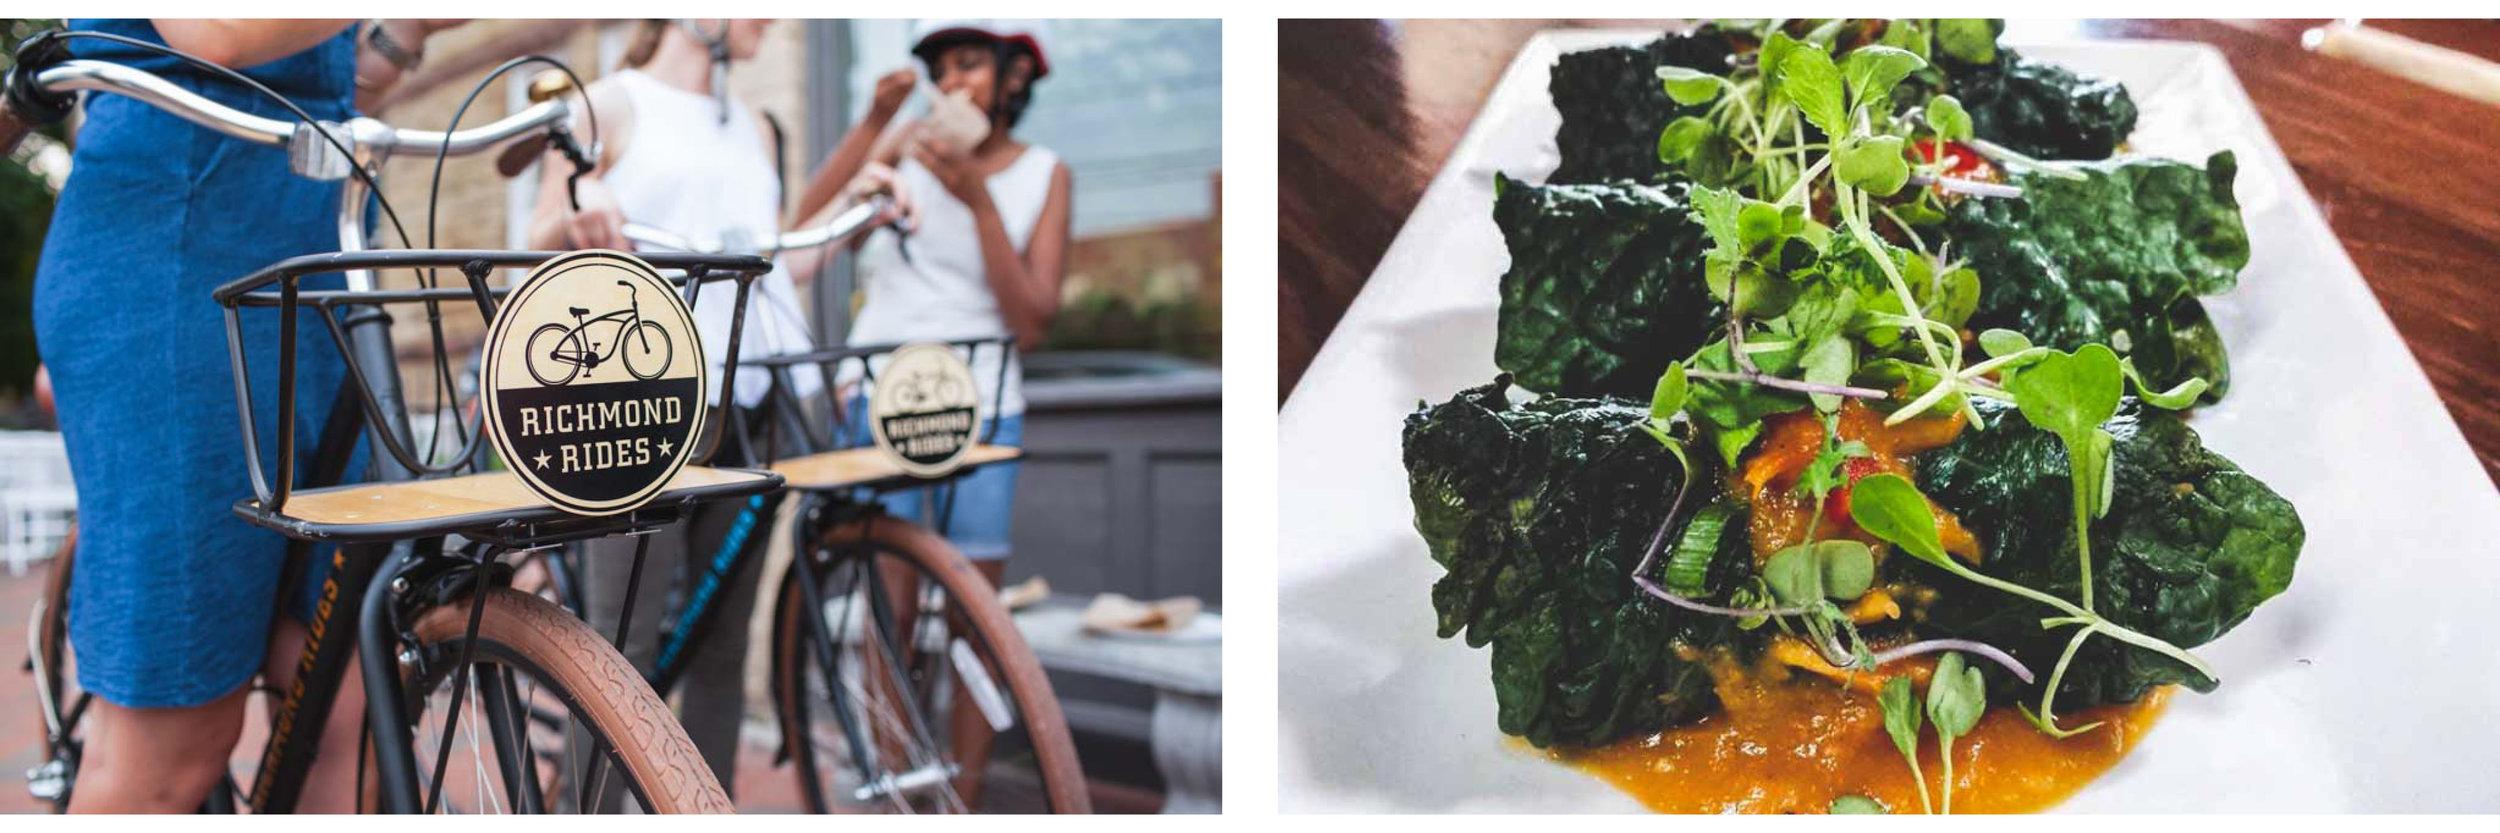 Photo Credits:  Richmond Rides  /  The Daily Kitchen & Bar